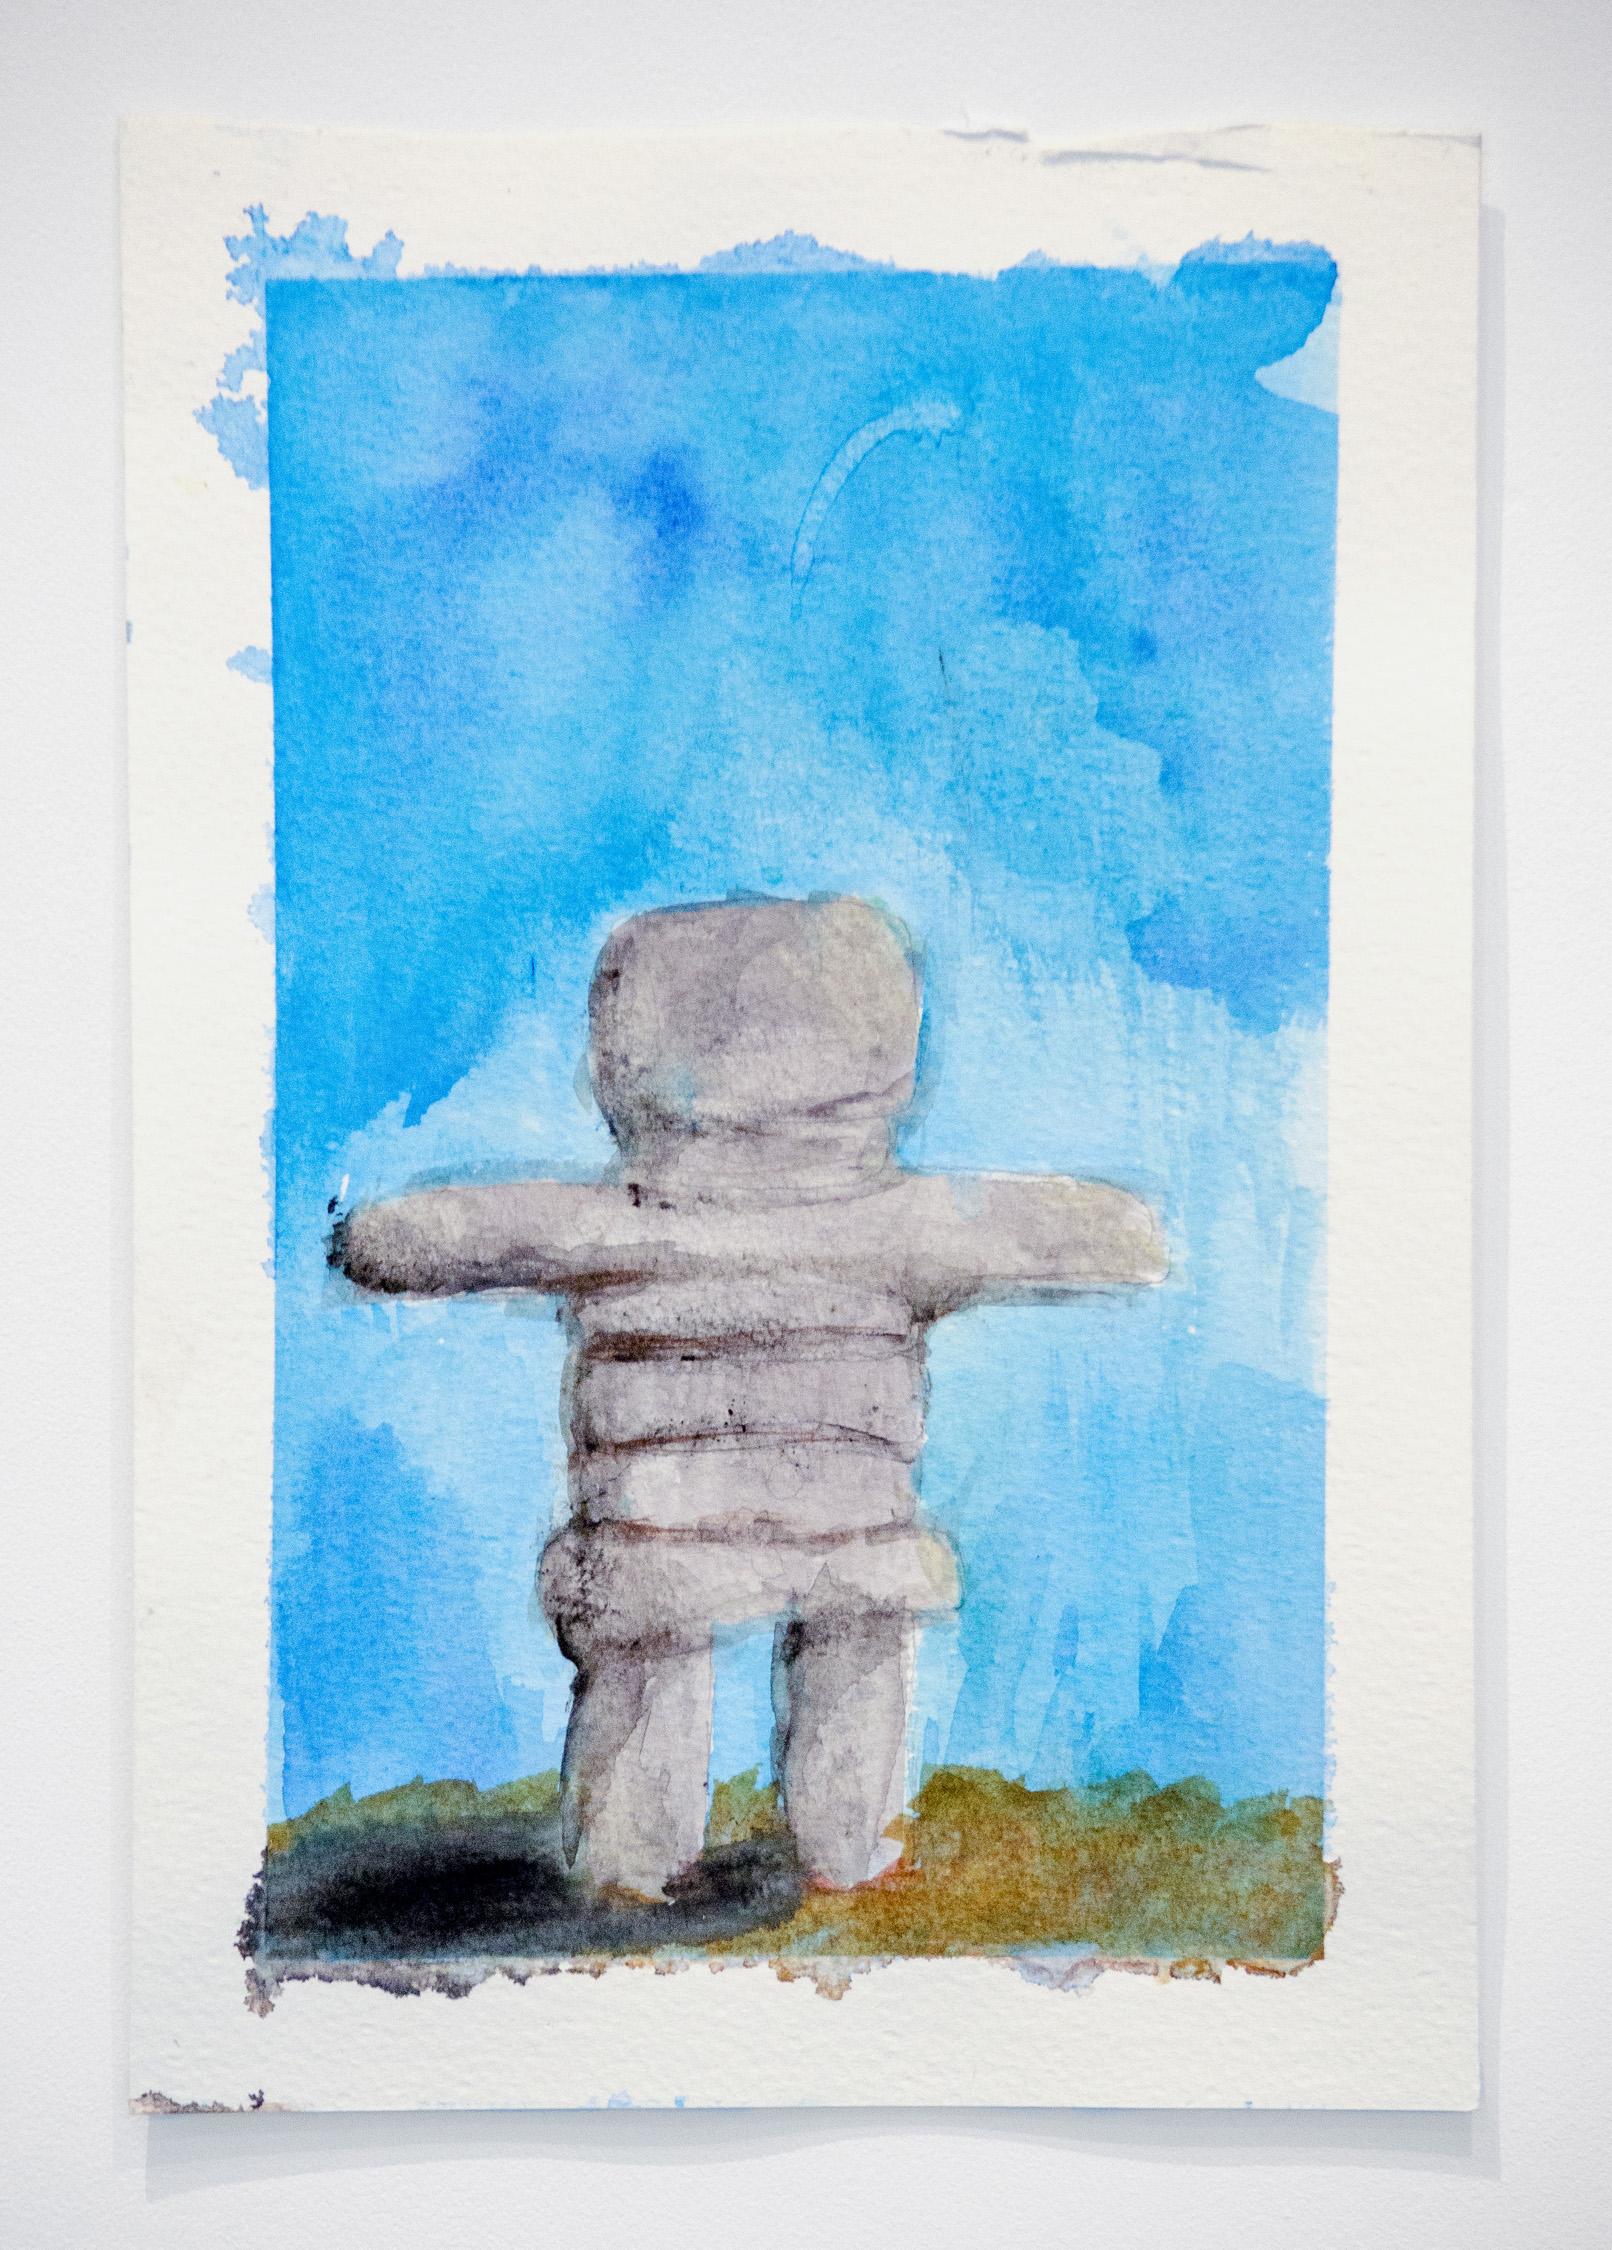 Alexia D'Monte,    Rockman,  2019, Watercolor on paper, 10.5 x 7 inches (26.5 x 17.5 cm)